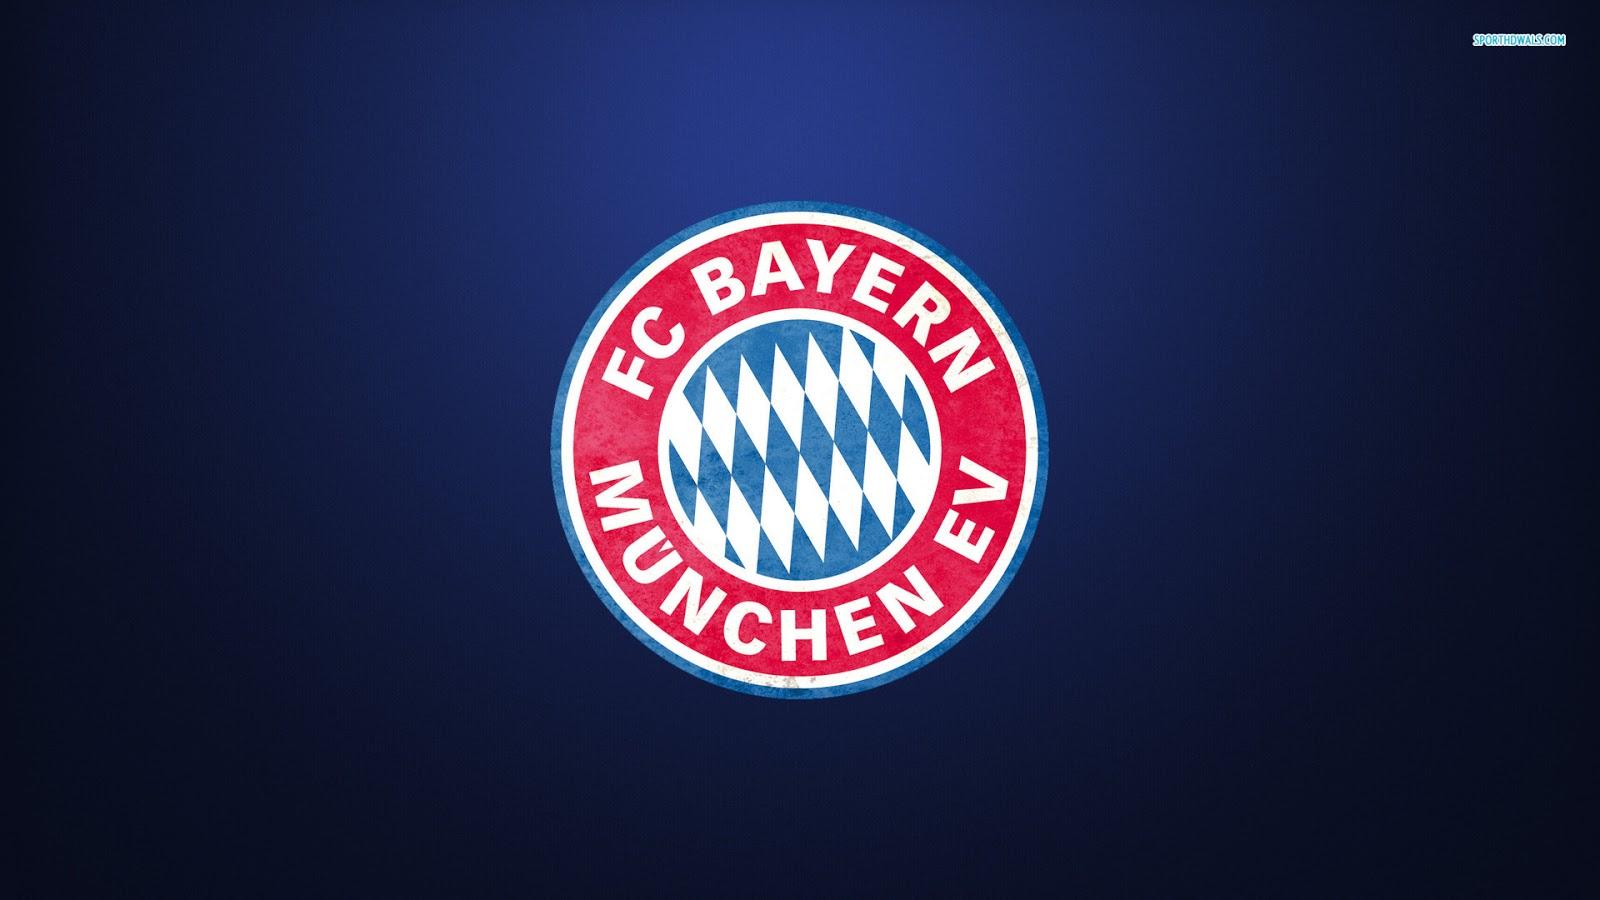 world wide soccer hd photos bayern munchen hd wallpaper